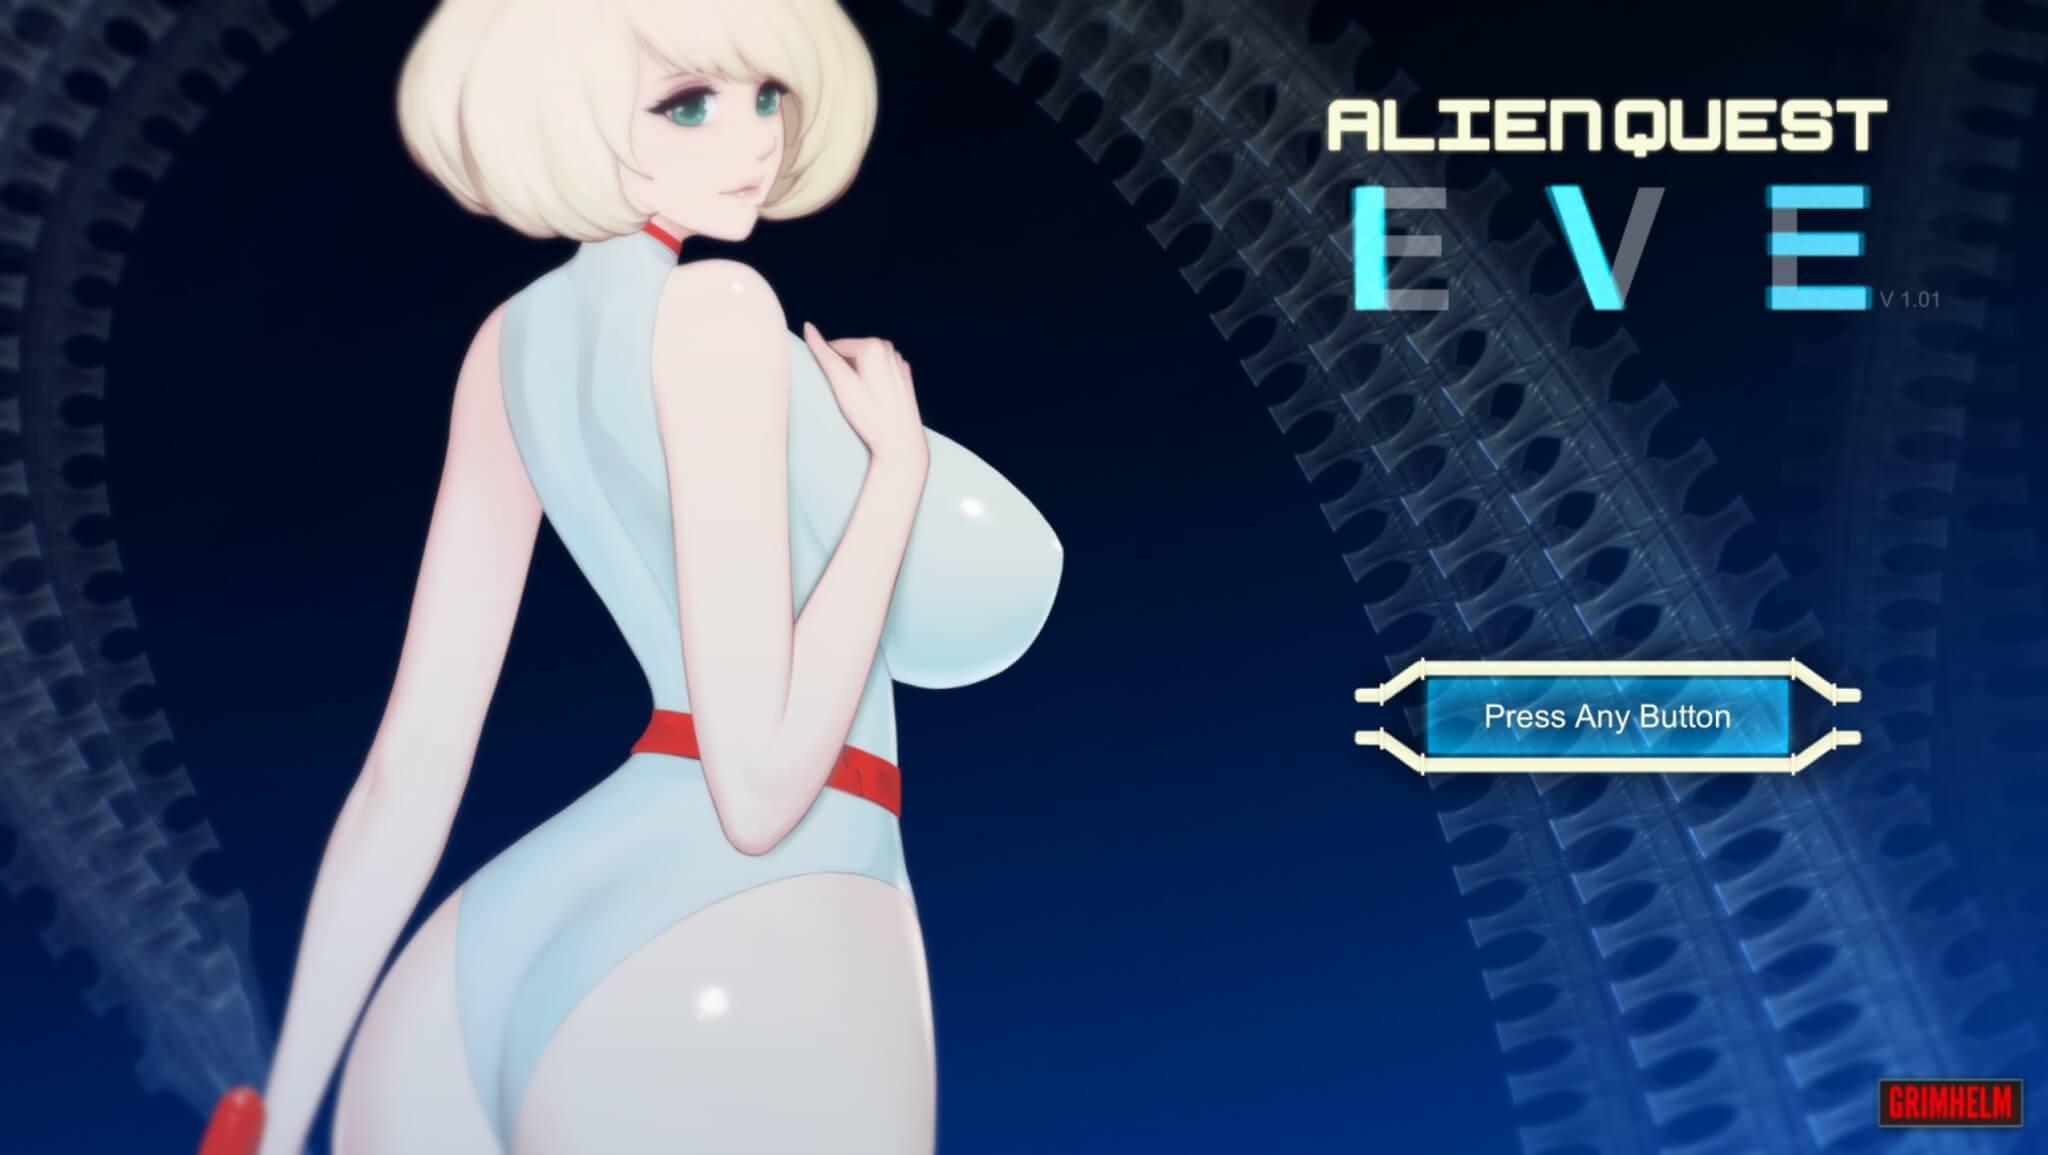 Alien Quest EVE v1.01